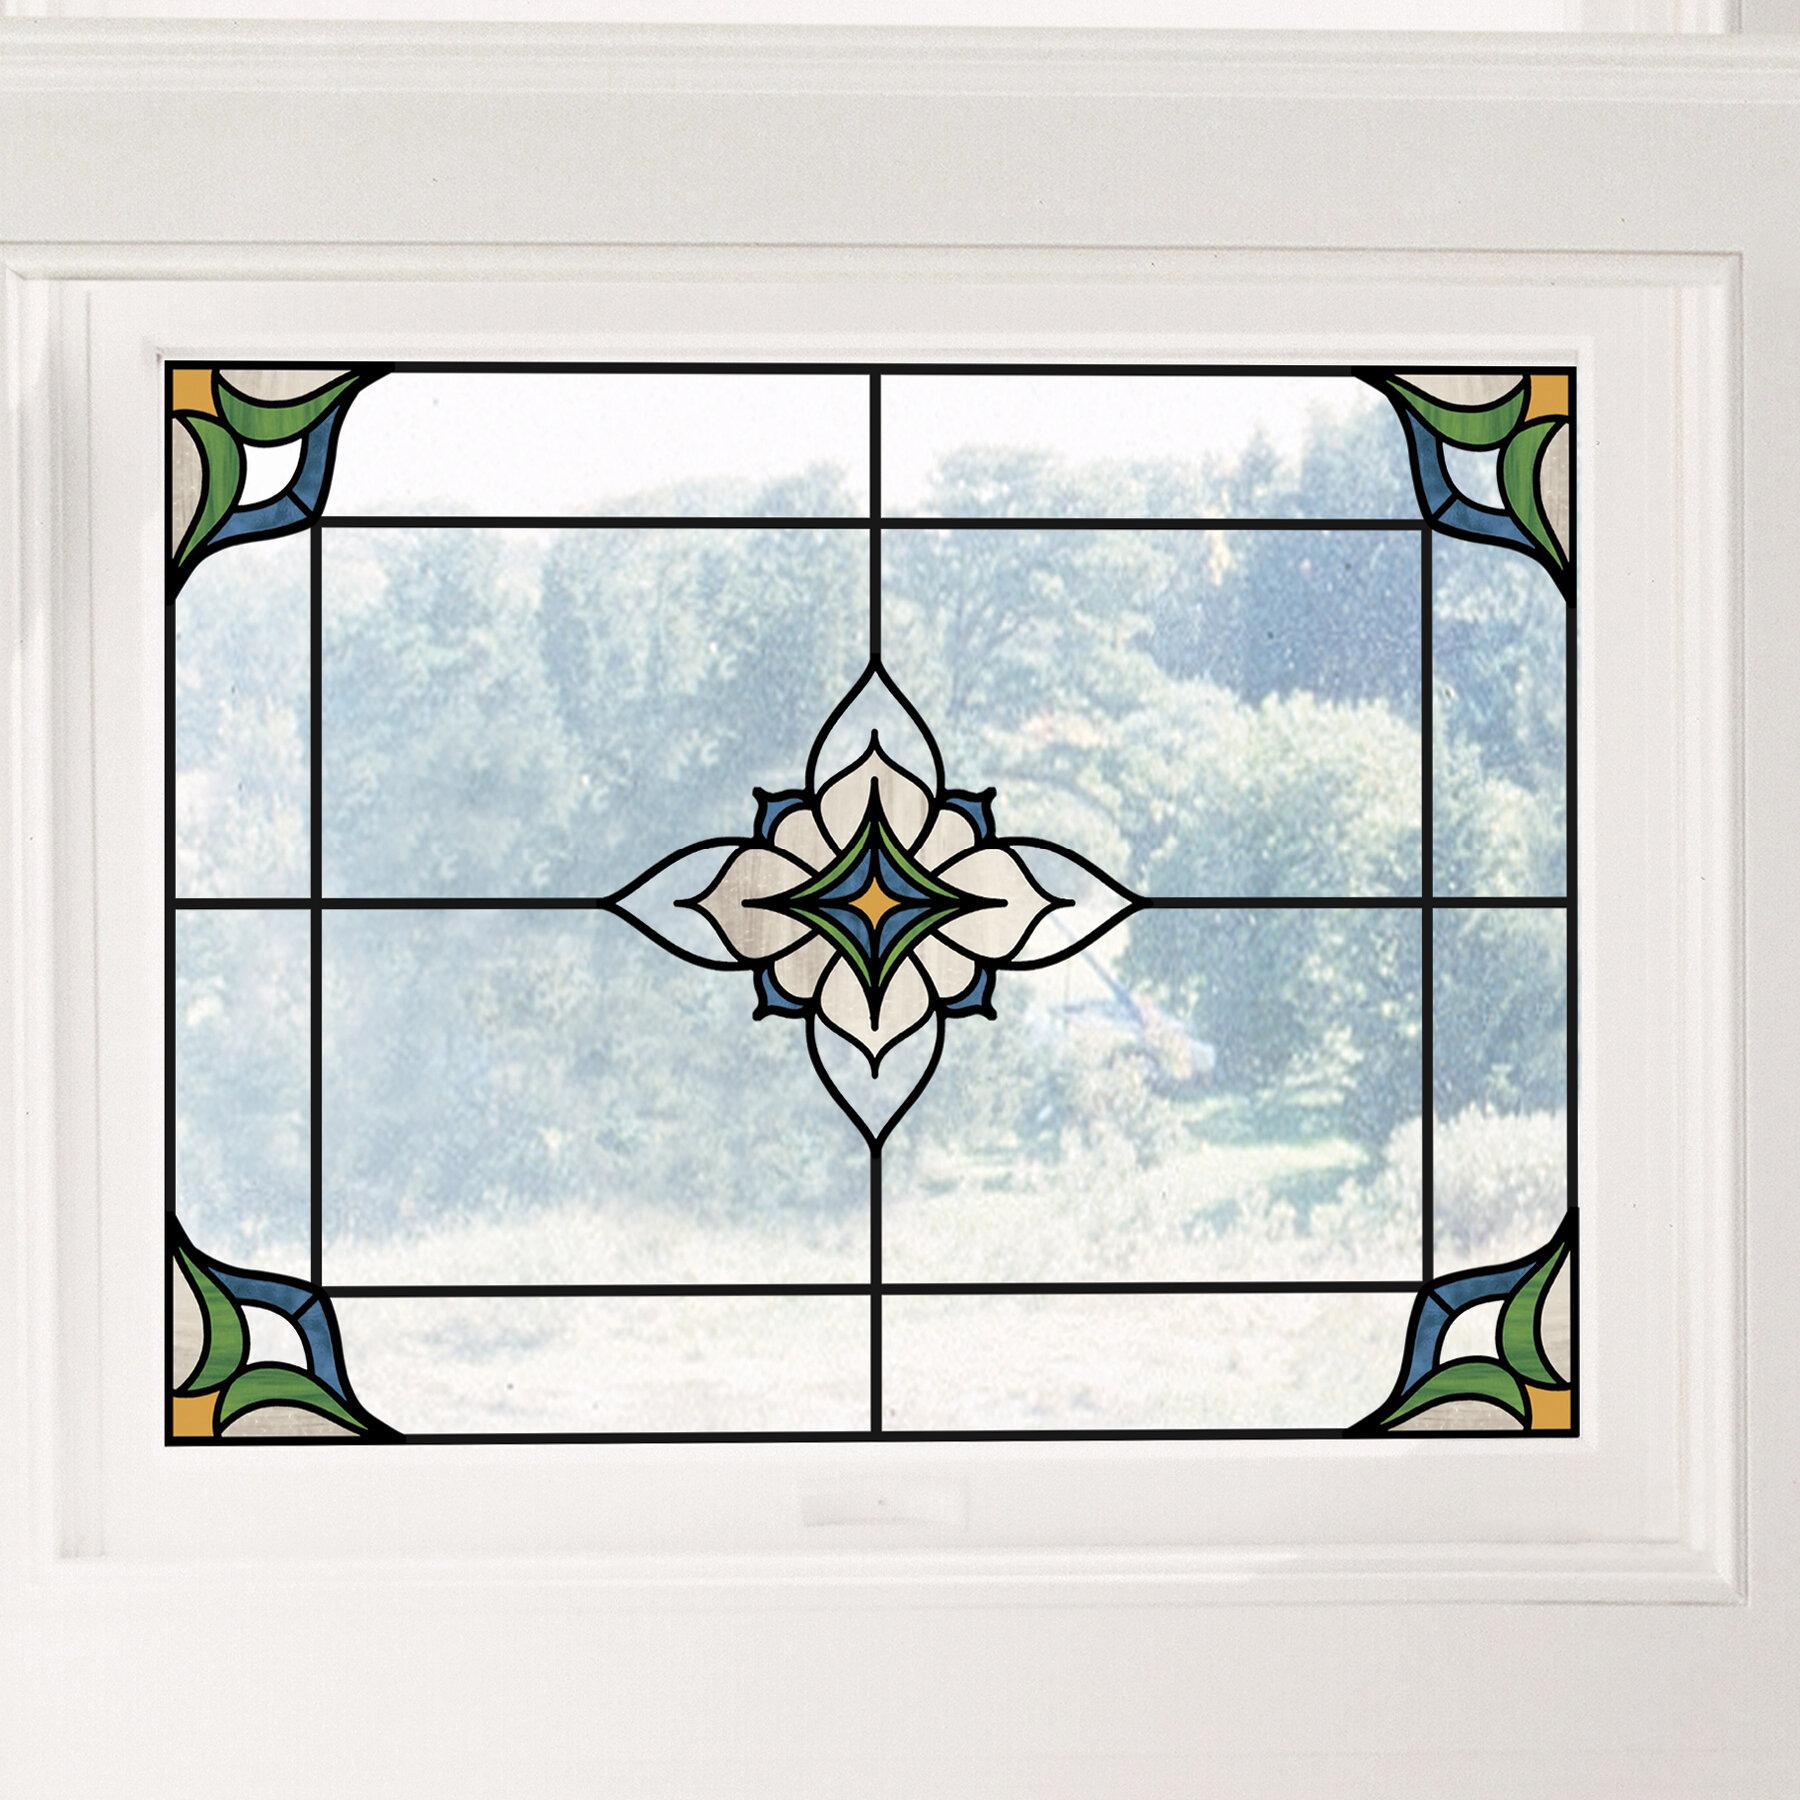 36x24 Garage Sale CGSignLab Basic Teal Window Cling